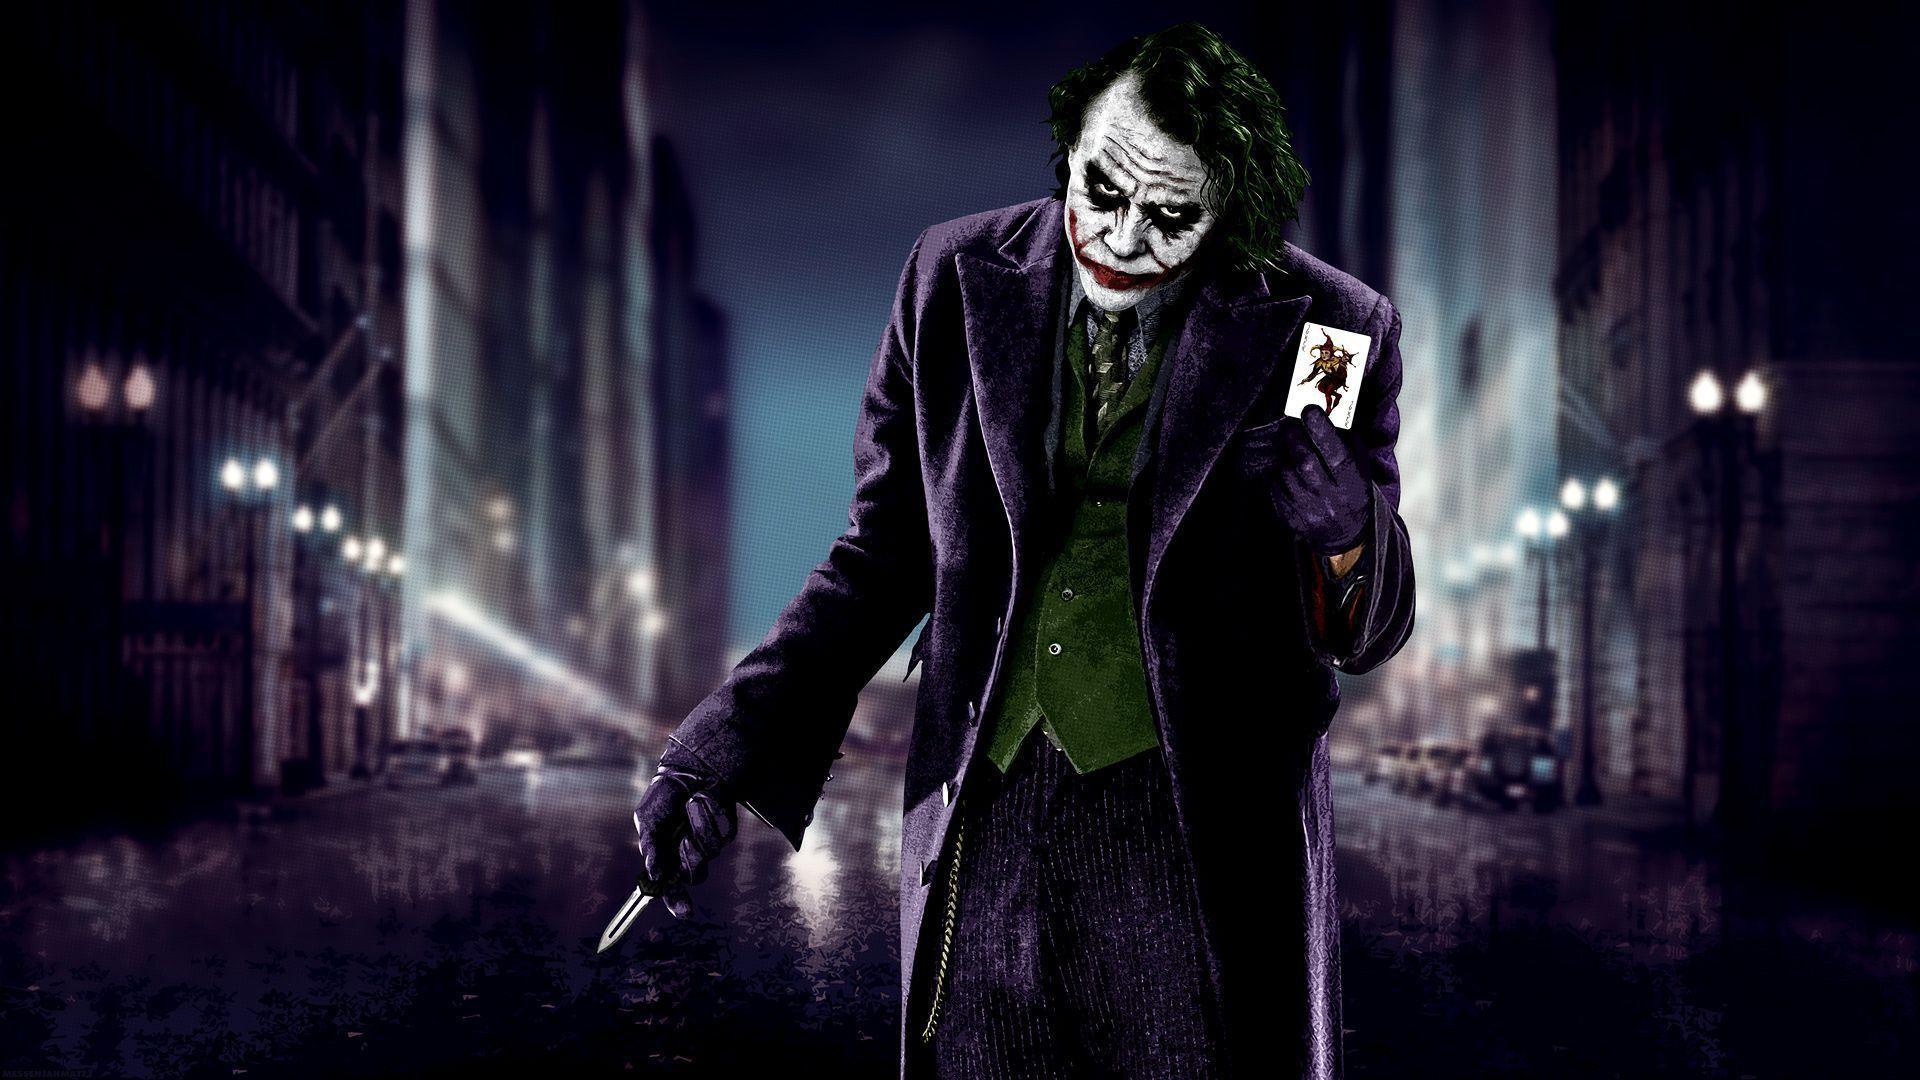 Joker Heath Ledger Wallpapers - Top Free Joker Heath Ledger Backgrounds - WallpaperAccess